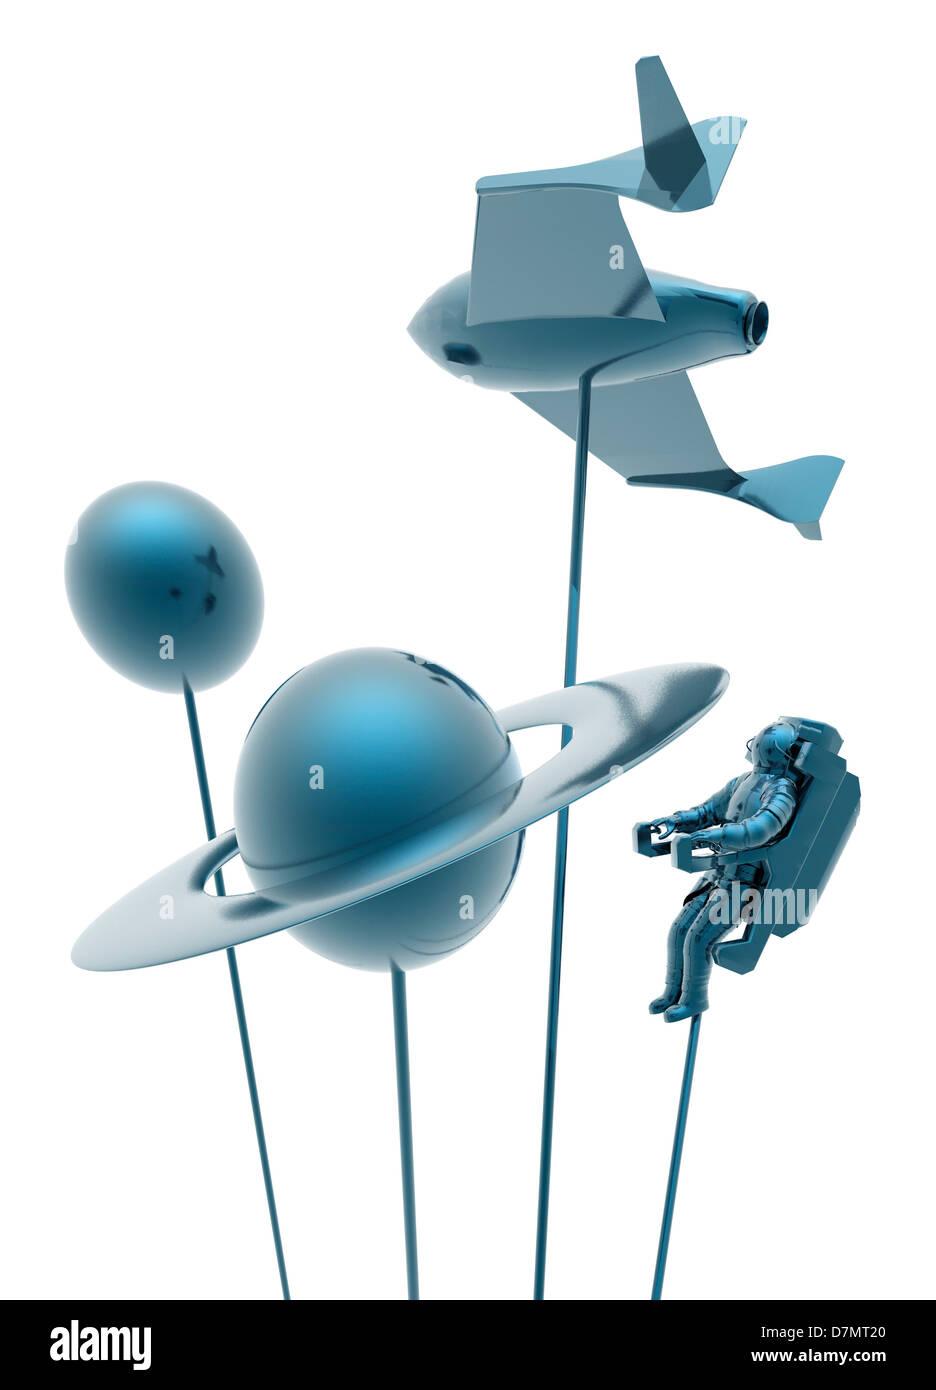 Weltraumtourismus, konzeptuellen Kunstwerk Stockbild